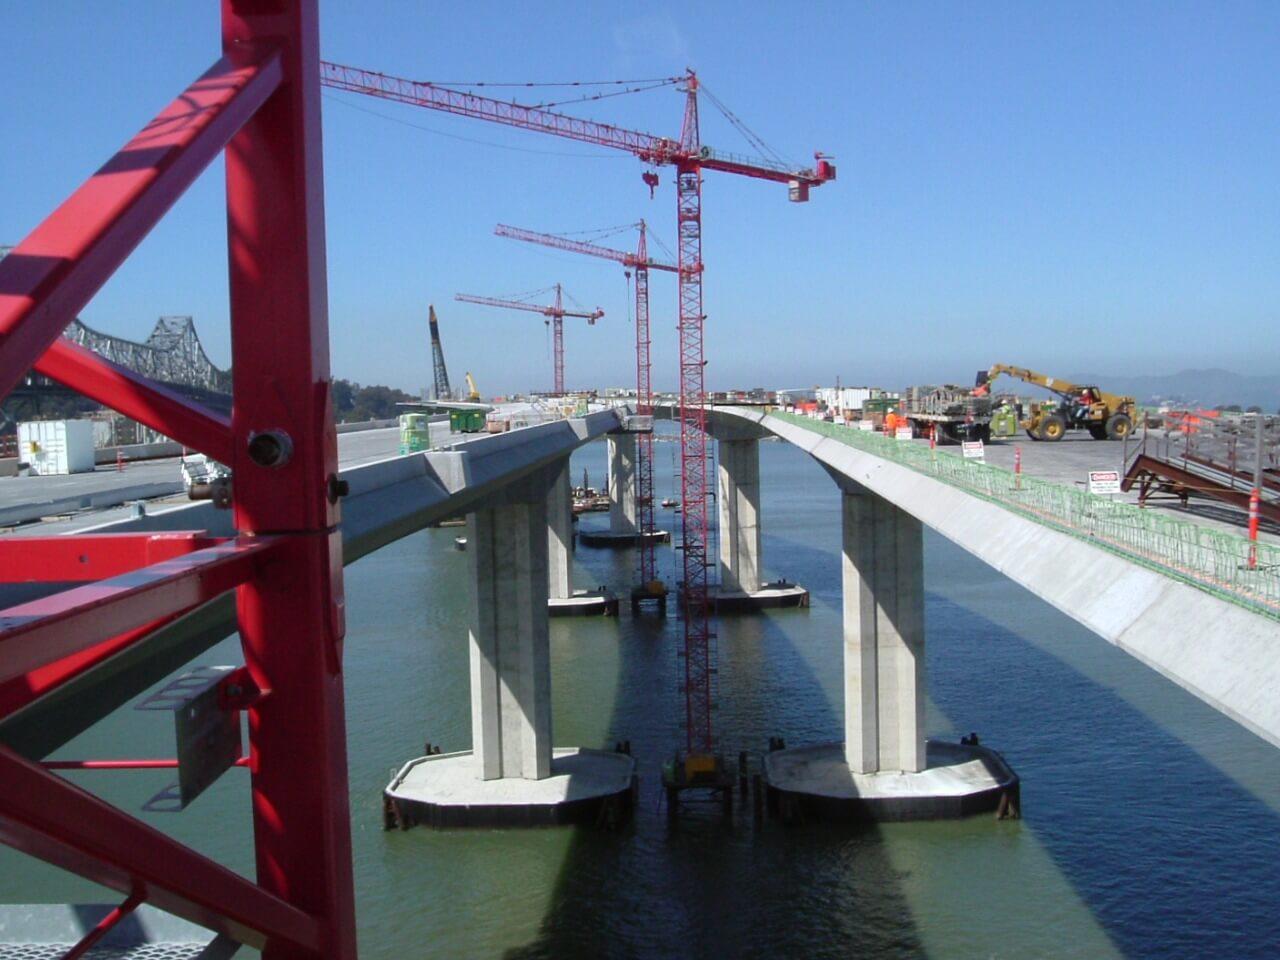 engineering-risk-mitigation-san_francisco_oakland_bay_bridge_between_the_spans